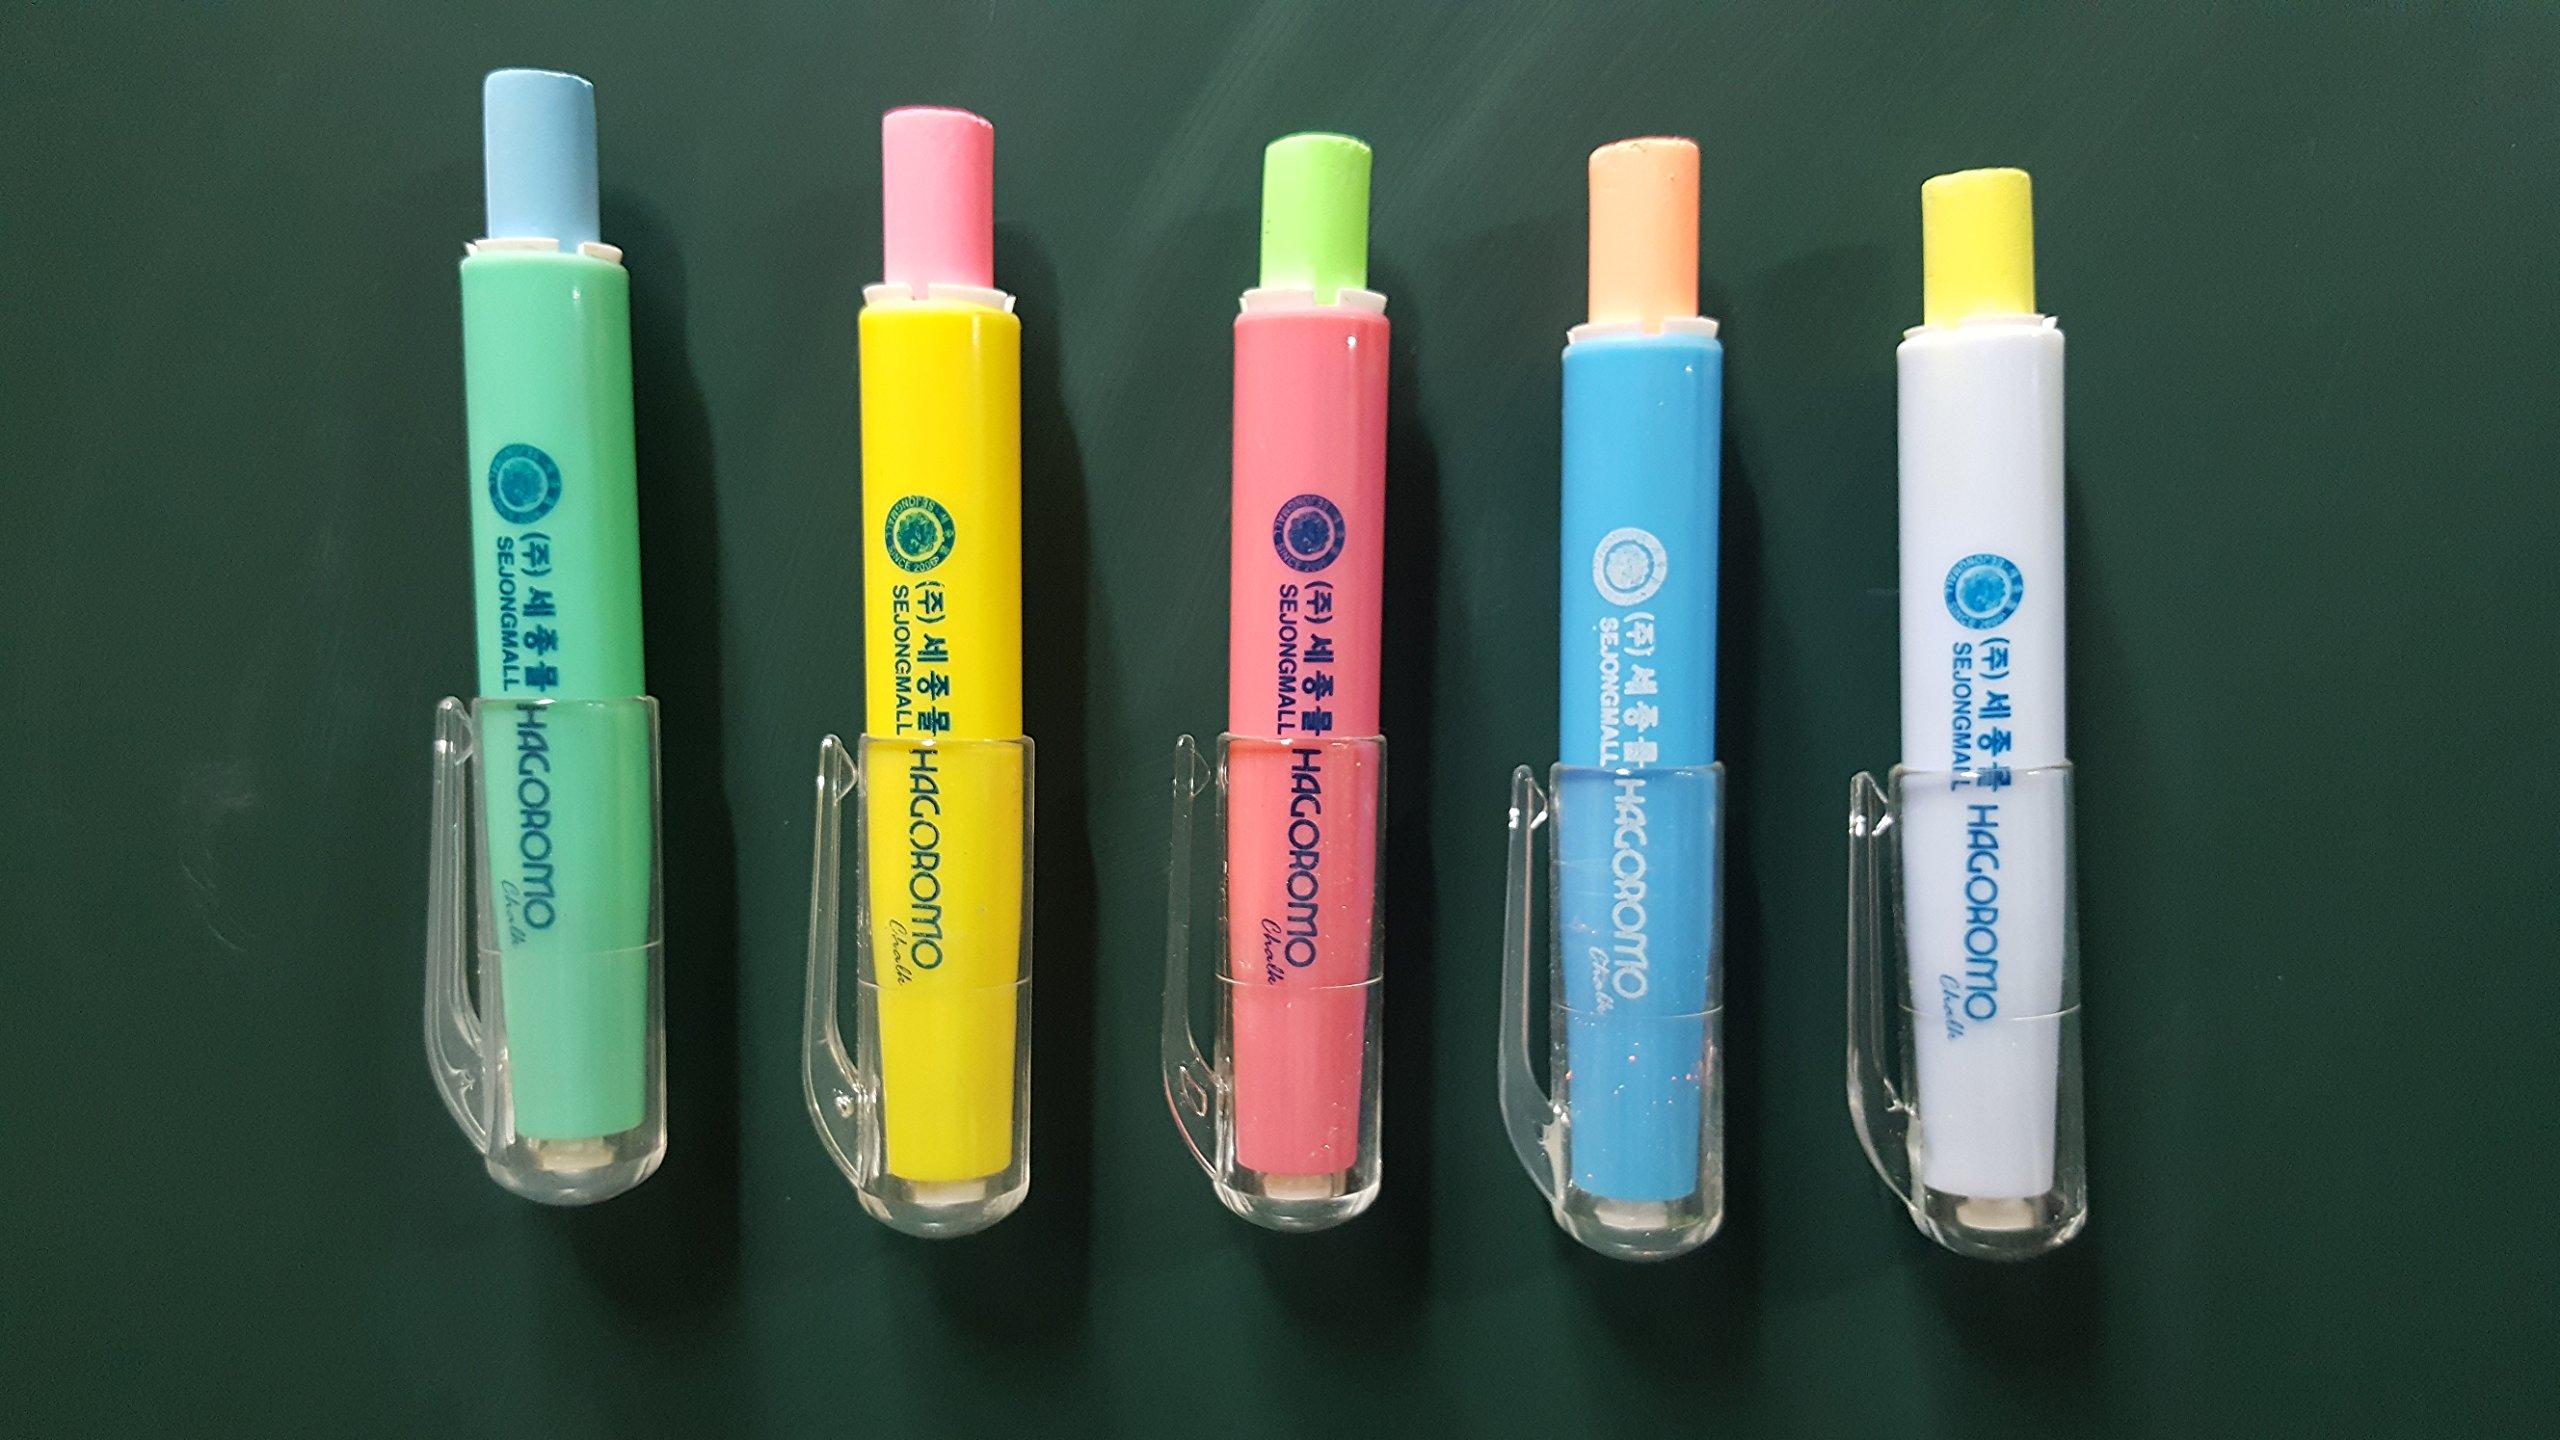 Hagoromo Wood Holder Case with 5 Colors Chalk Holder by Hagoromo